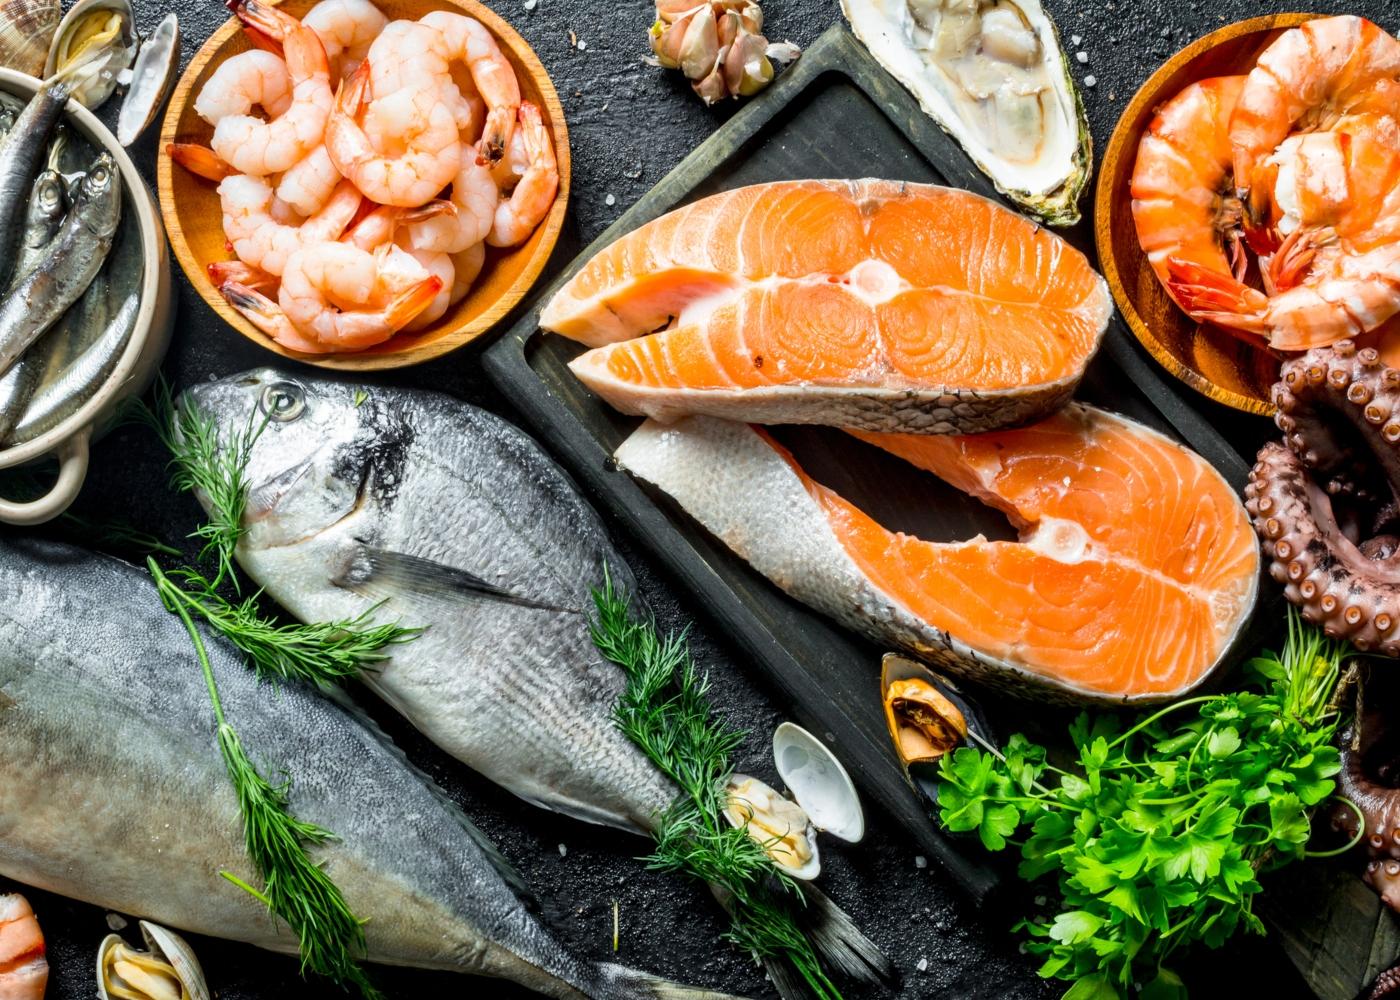 Variedade de peixe e marisco numa mesa